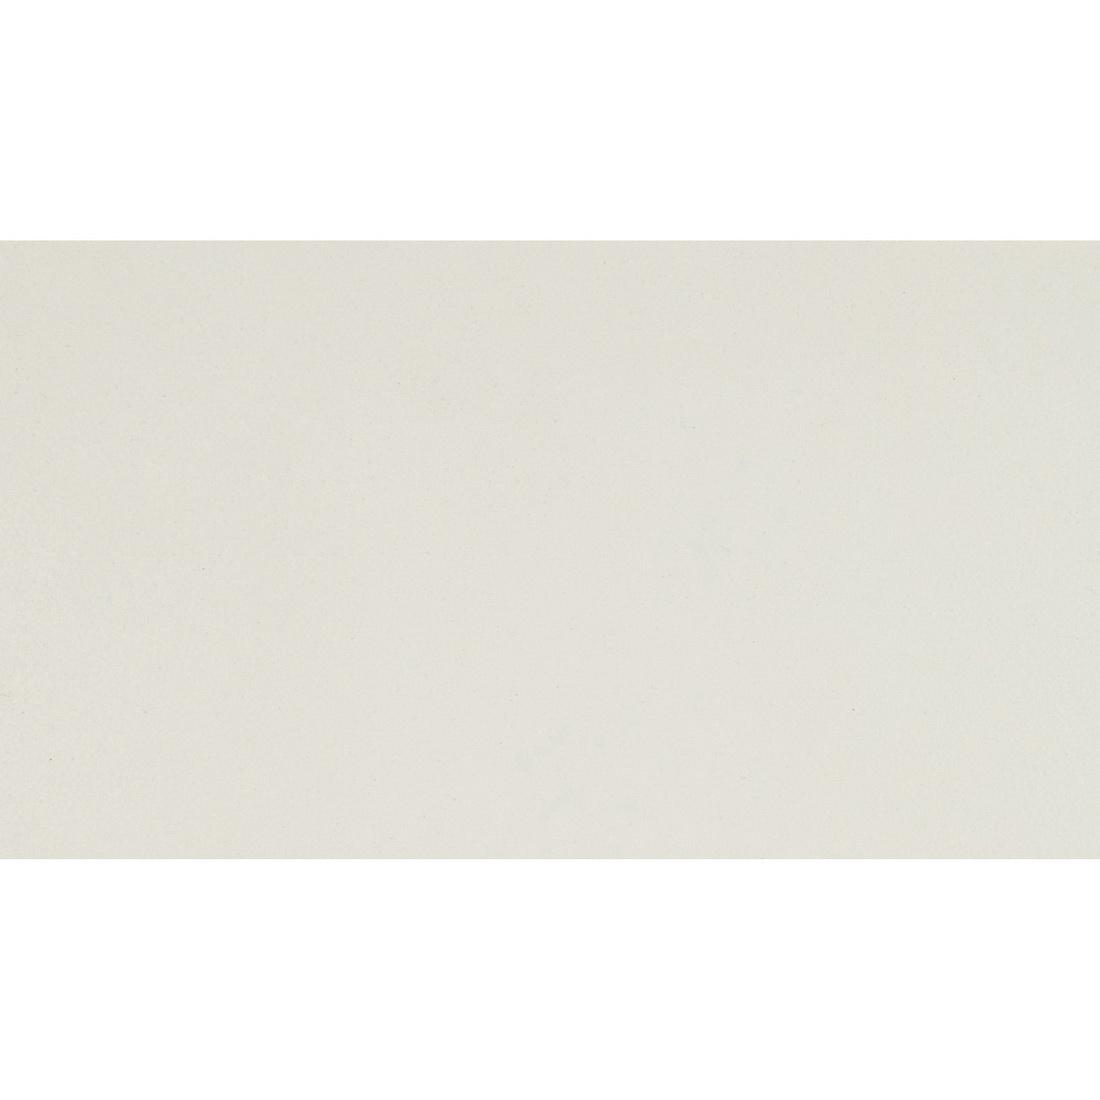 Territory Savanna 16x455x3030mm Panel Cloud 2 Sheet